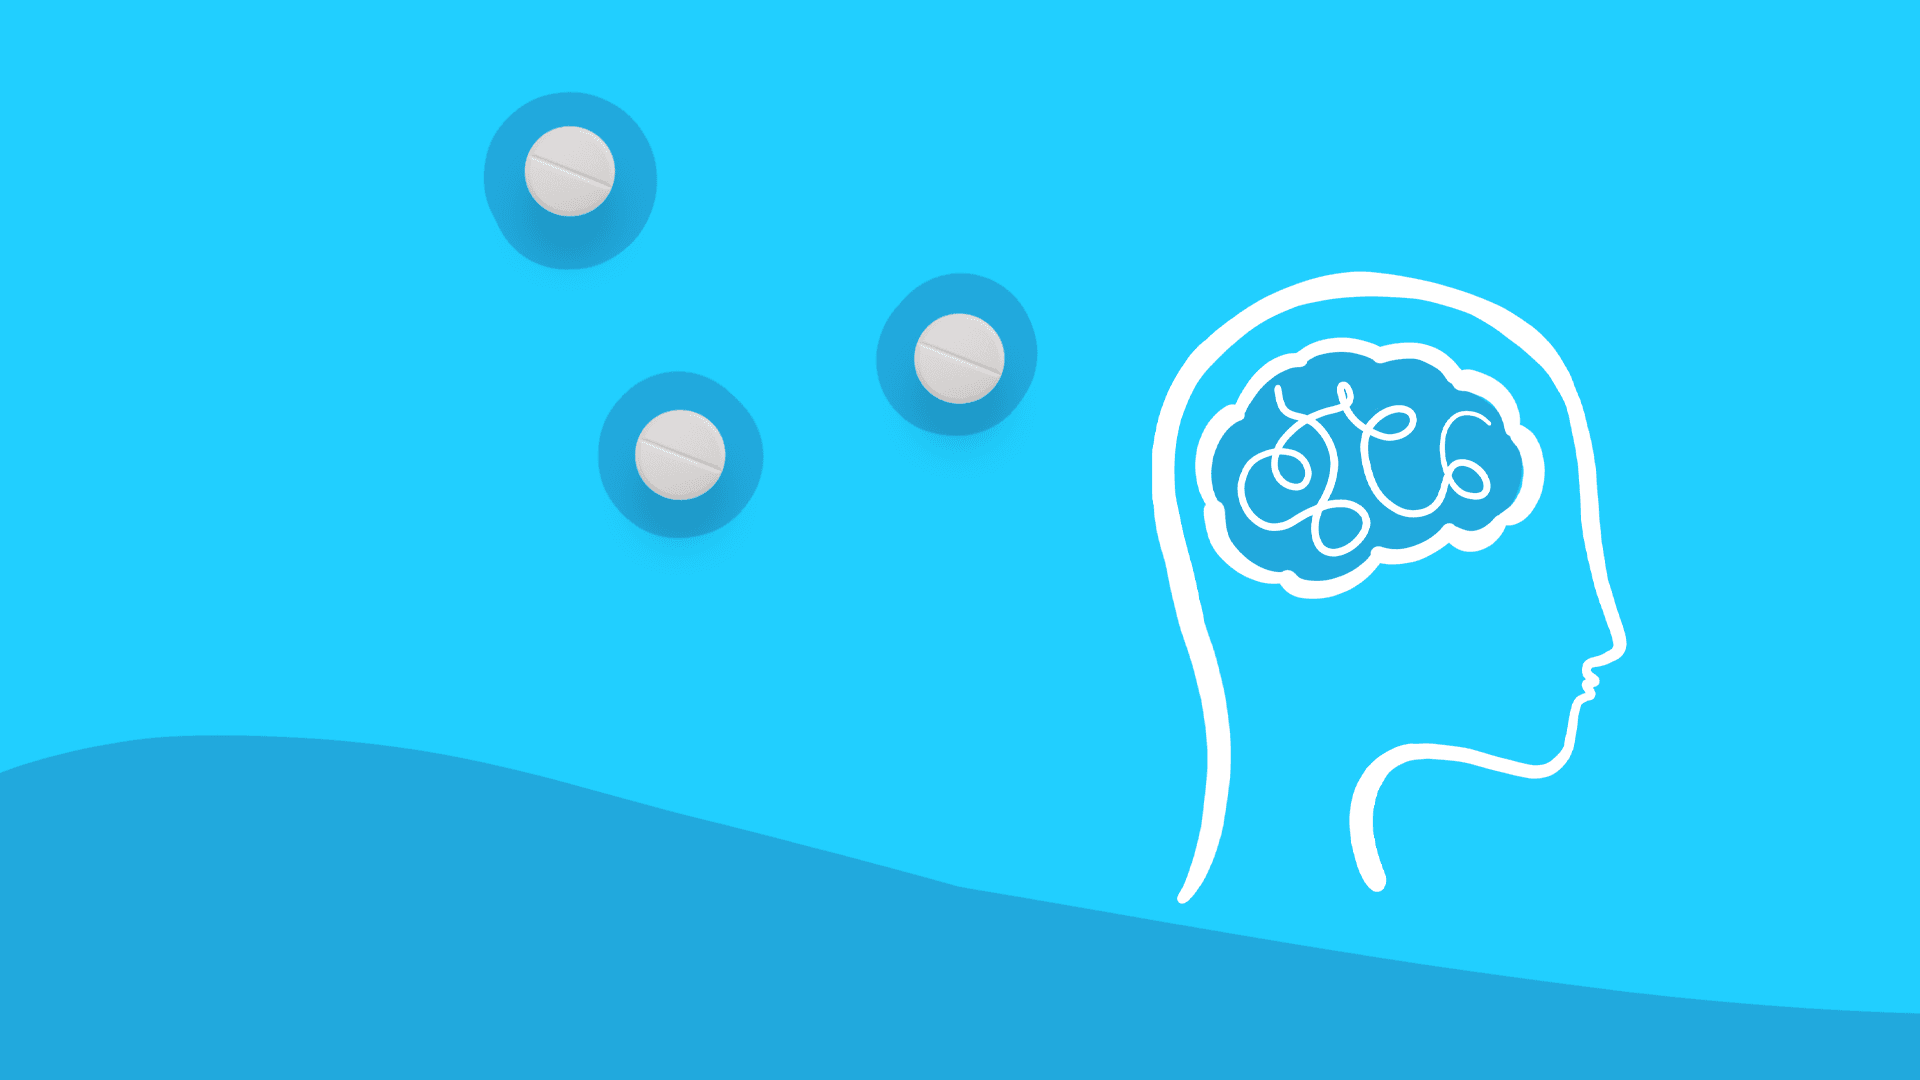 Does hydroxyzine for anxiety work?